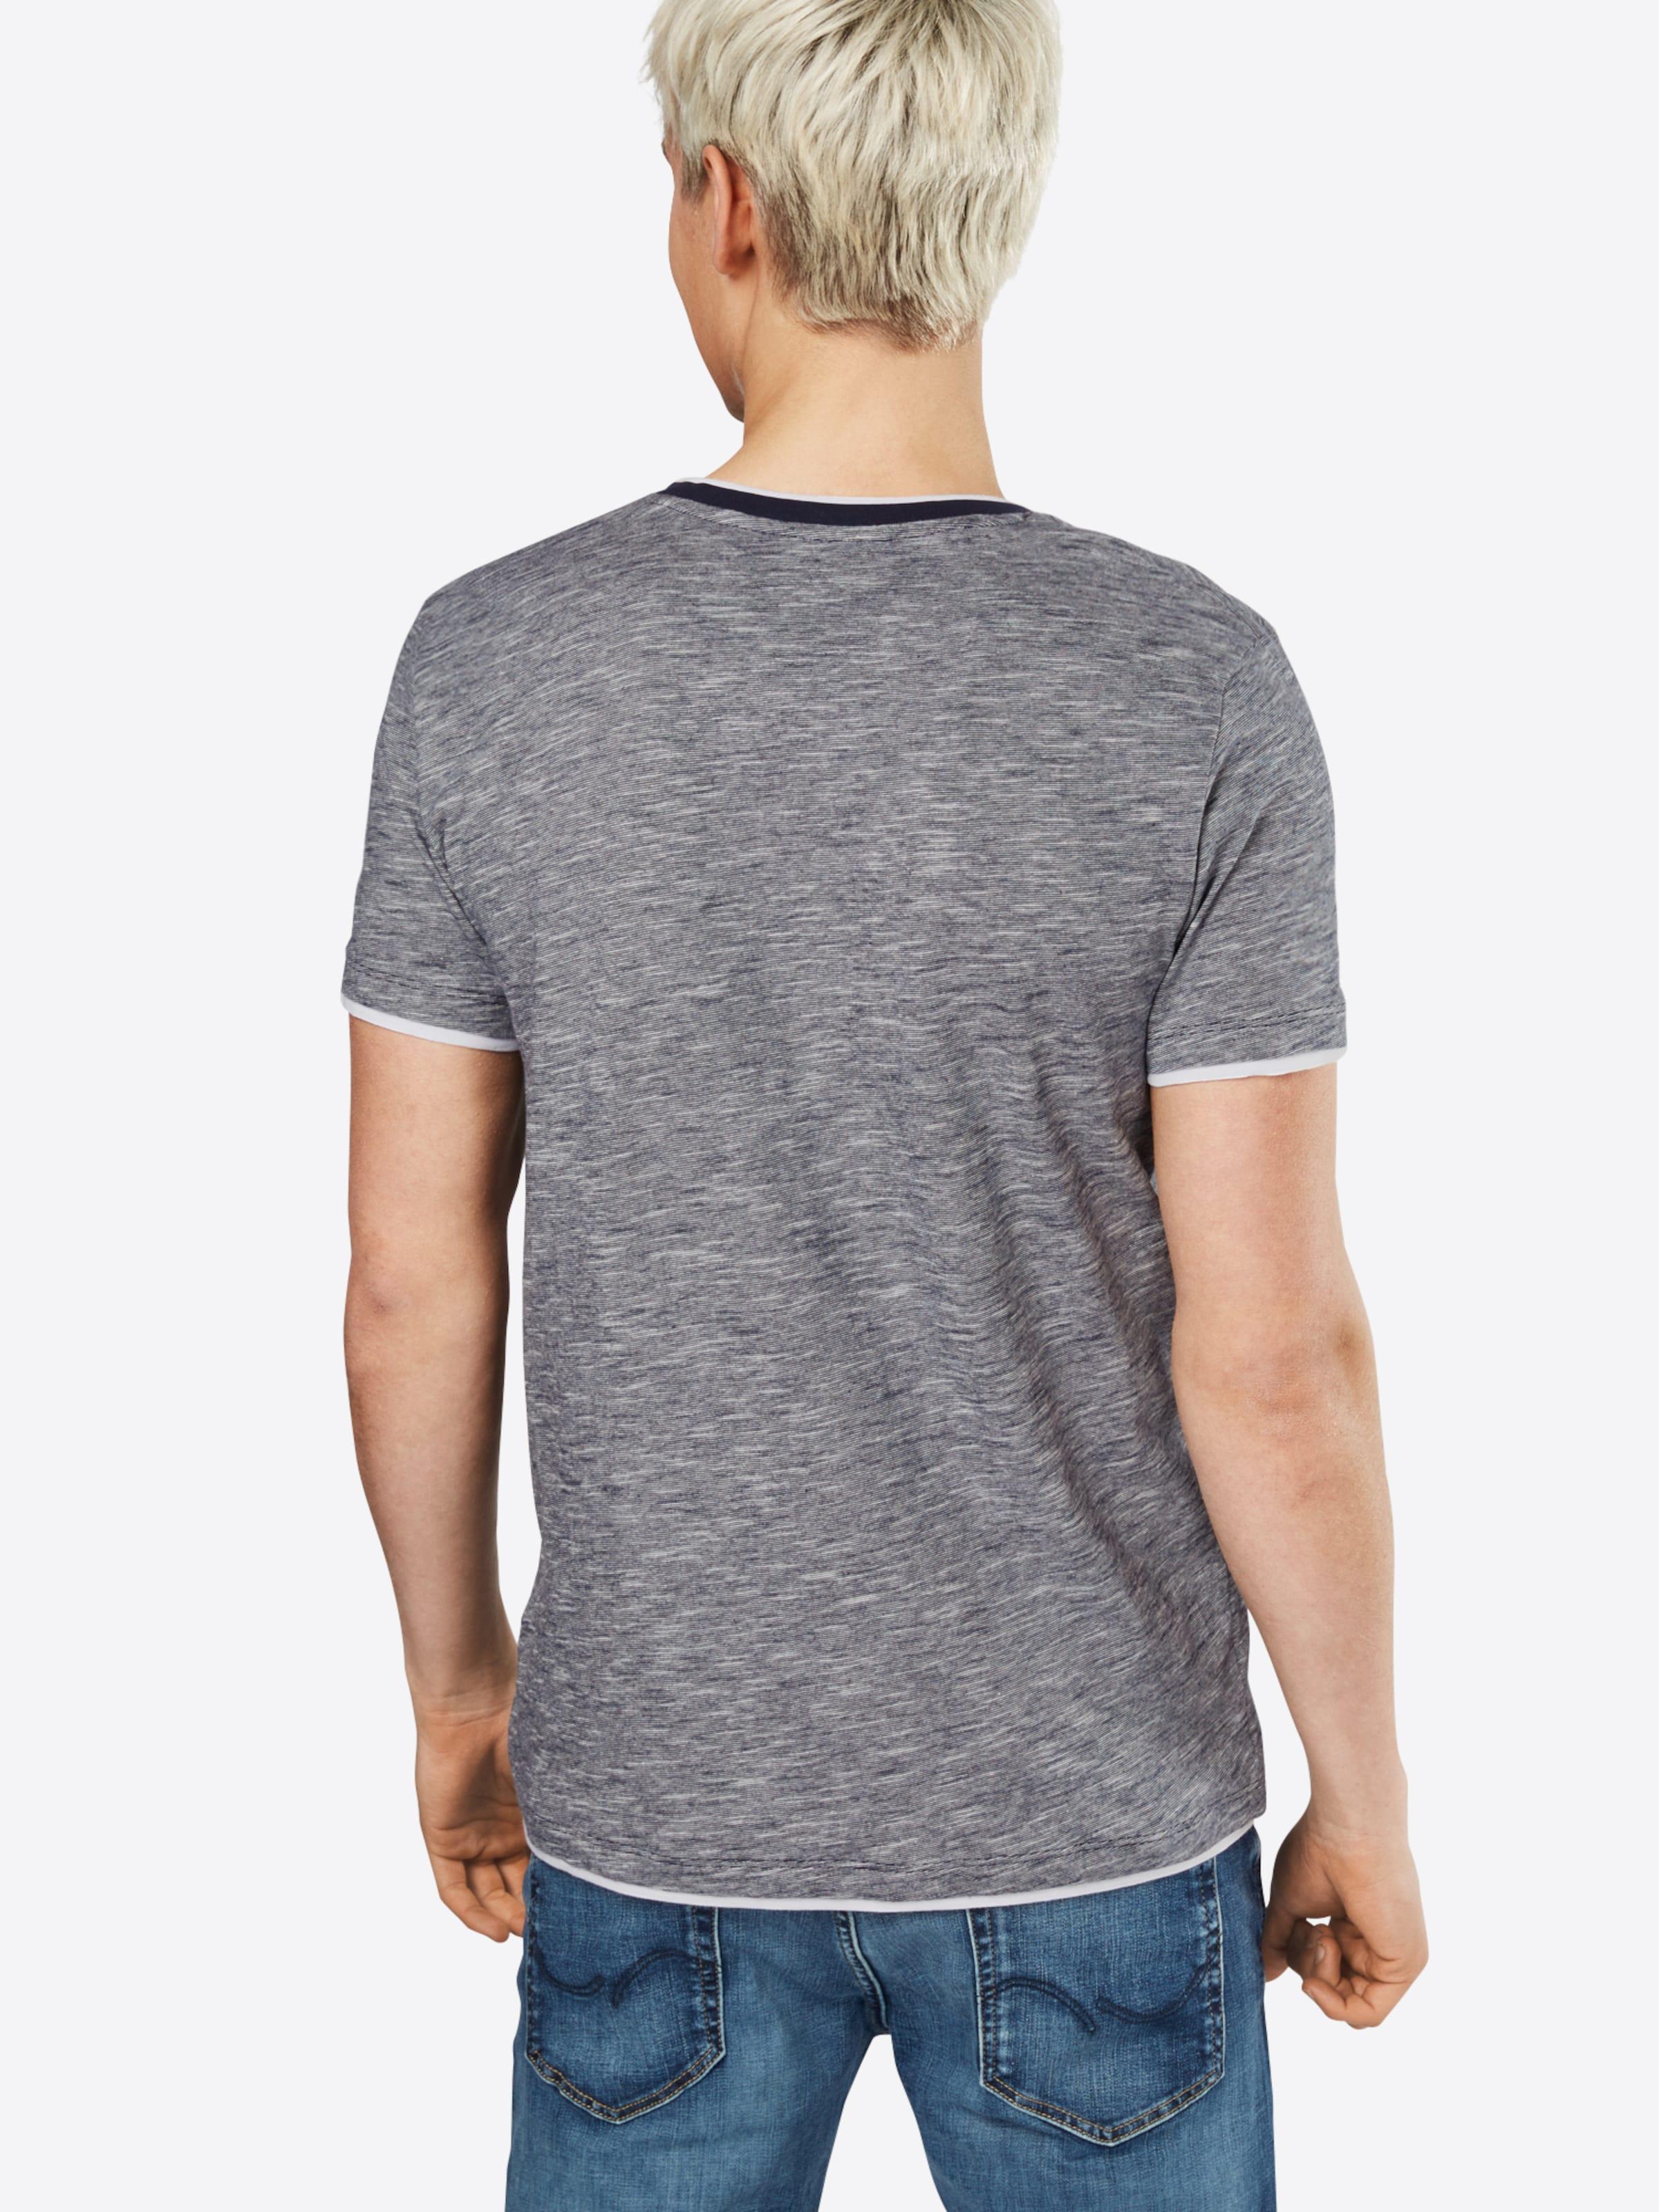 Offiziell Fachlich ESPRIT T-Shirt 'SG-998EE2K807' Sast Online WrCPGy